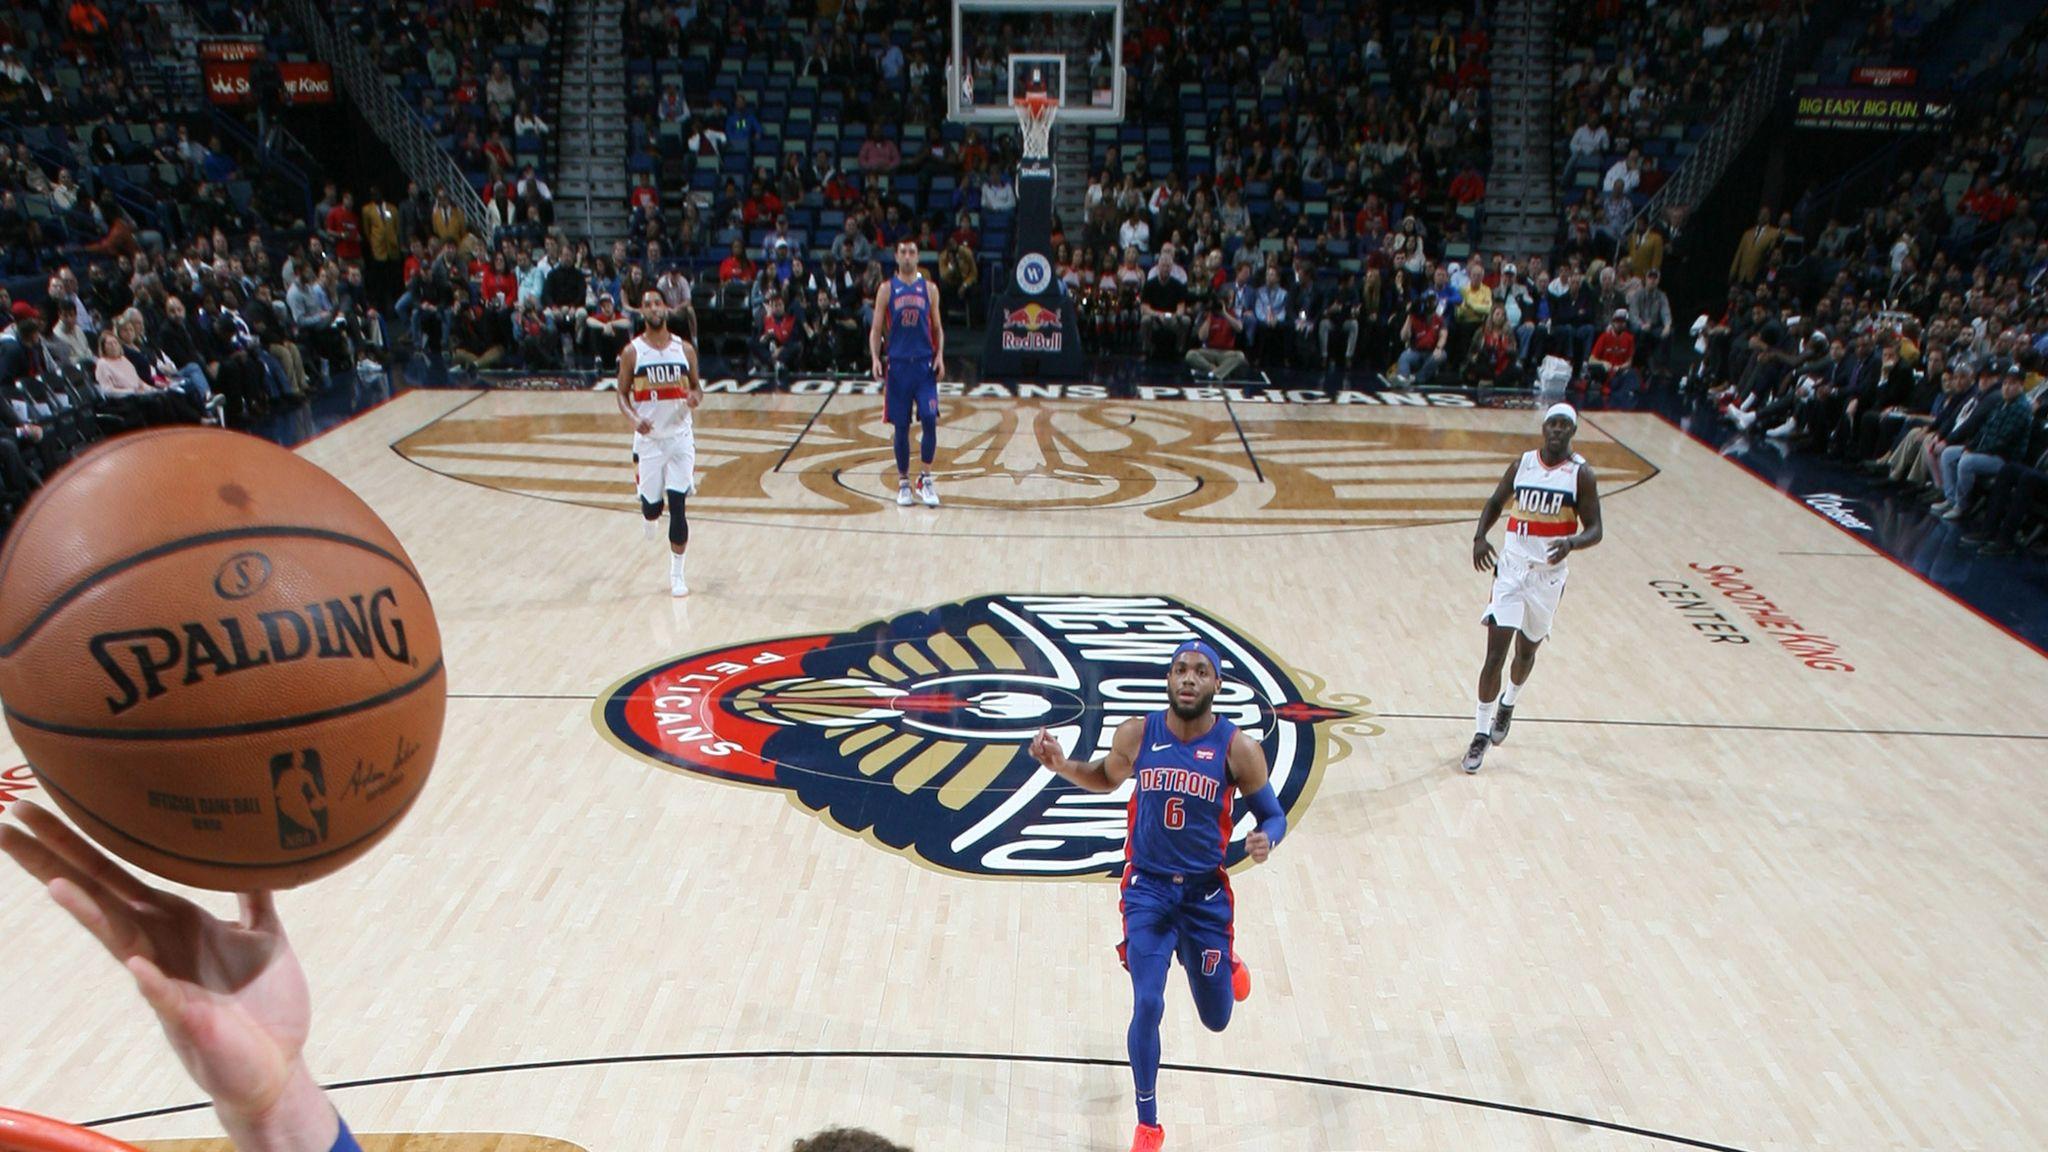 Detroit Pistons add veteran depth in bid for sustained playoff push